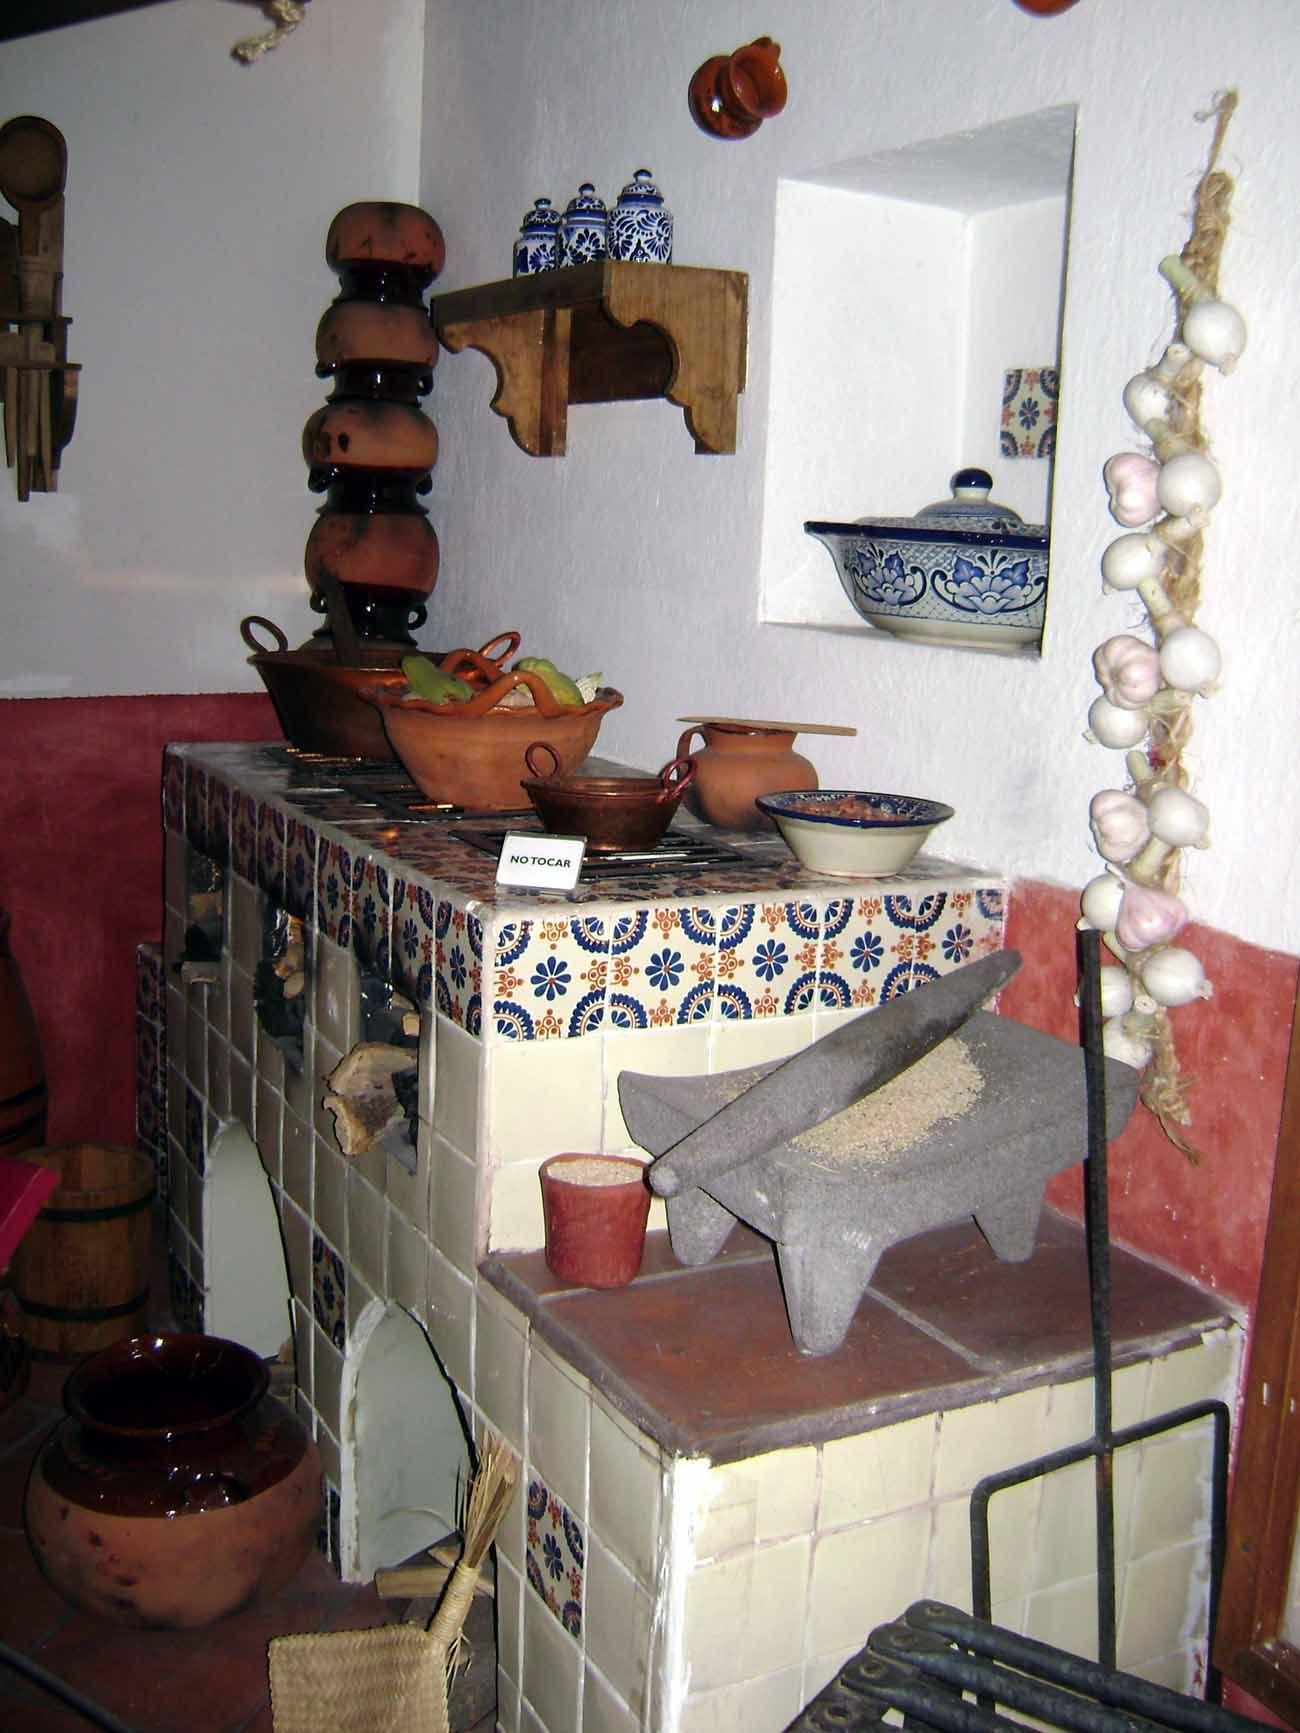 Cocina colonial estilo mexicano cocinas cocina for Decoracion colonial mexicana